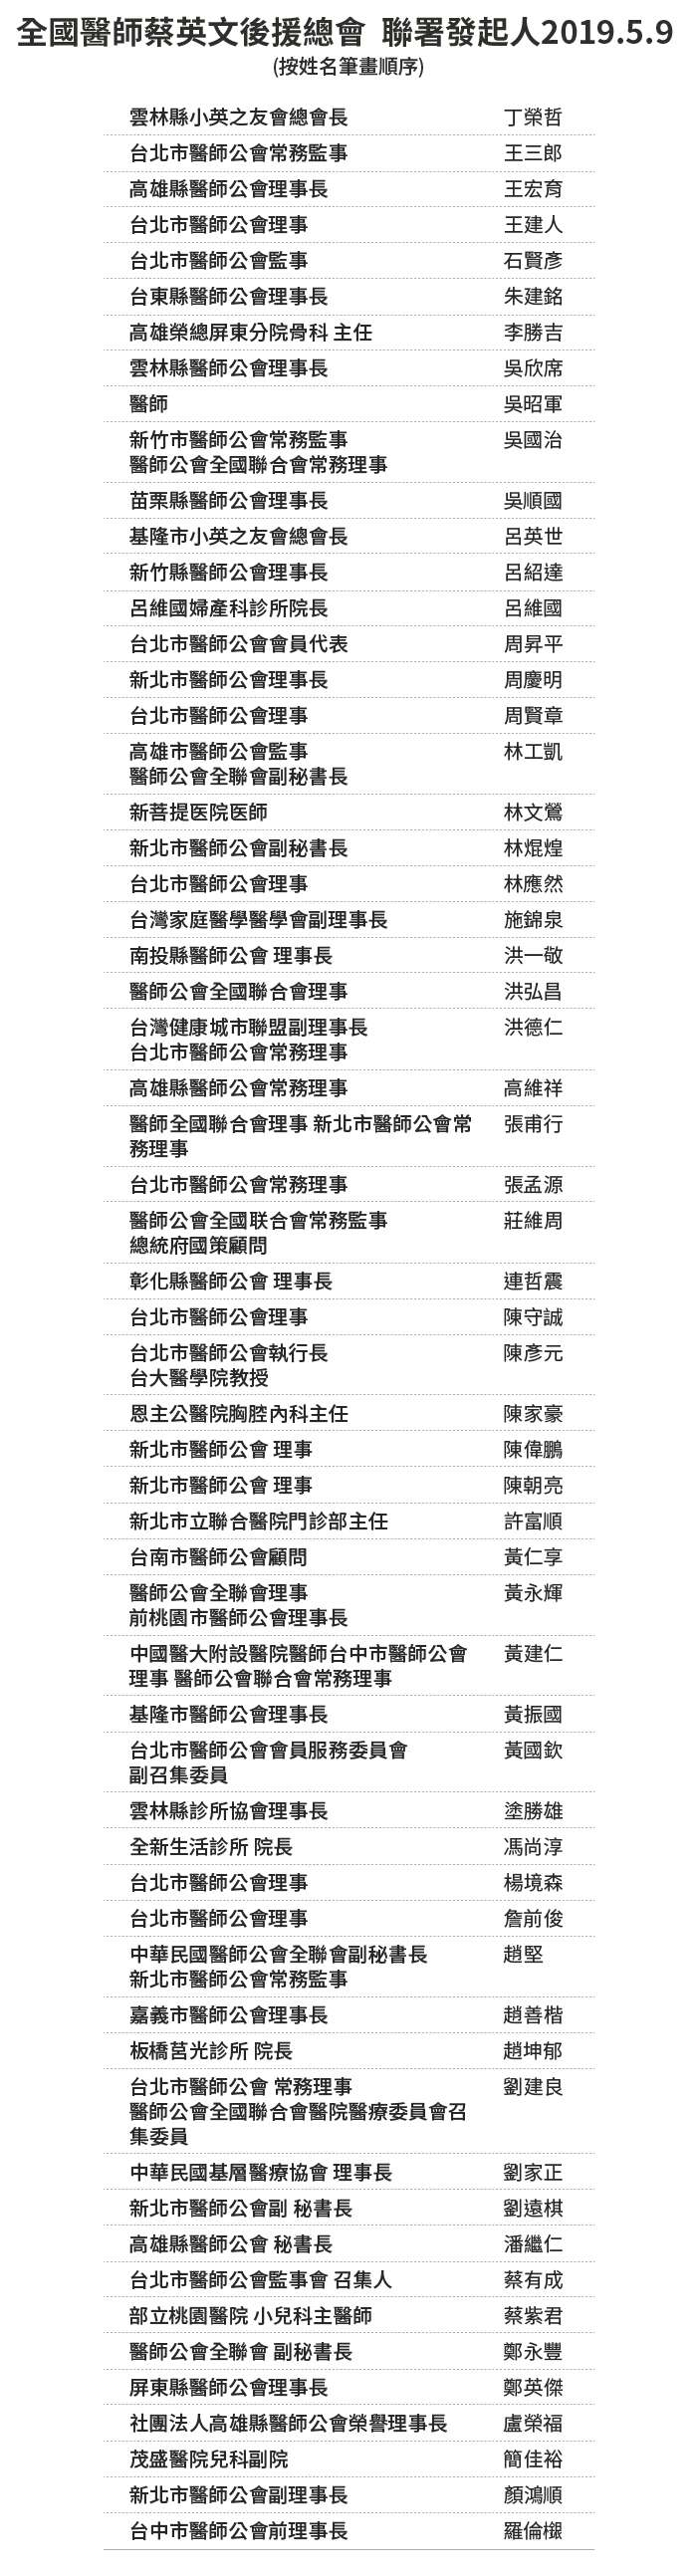 20190509-SMG0034-E01A-蔡英文總統連任聯署書+聯署發起人